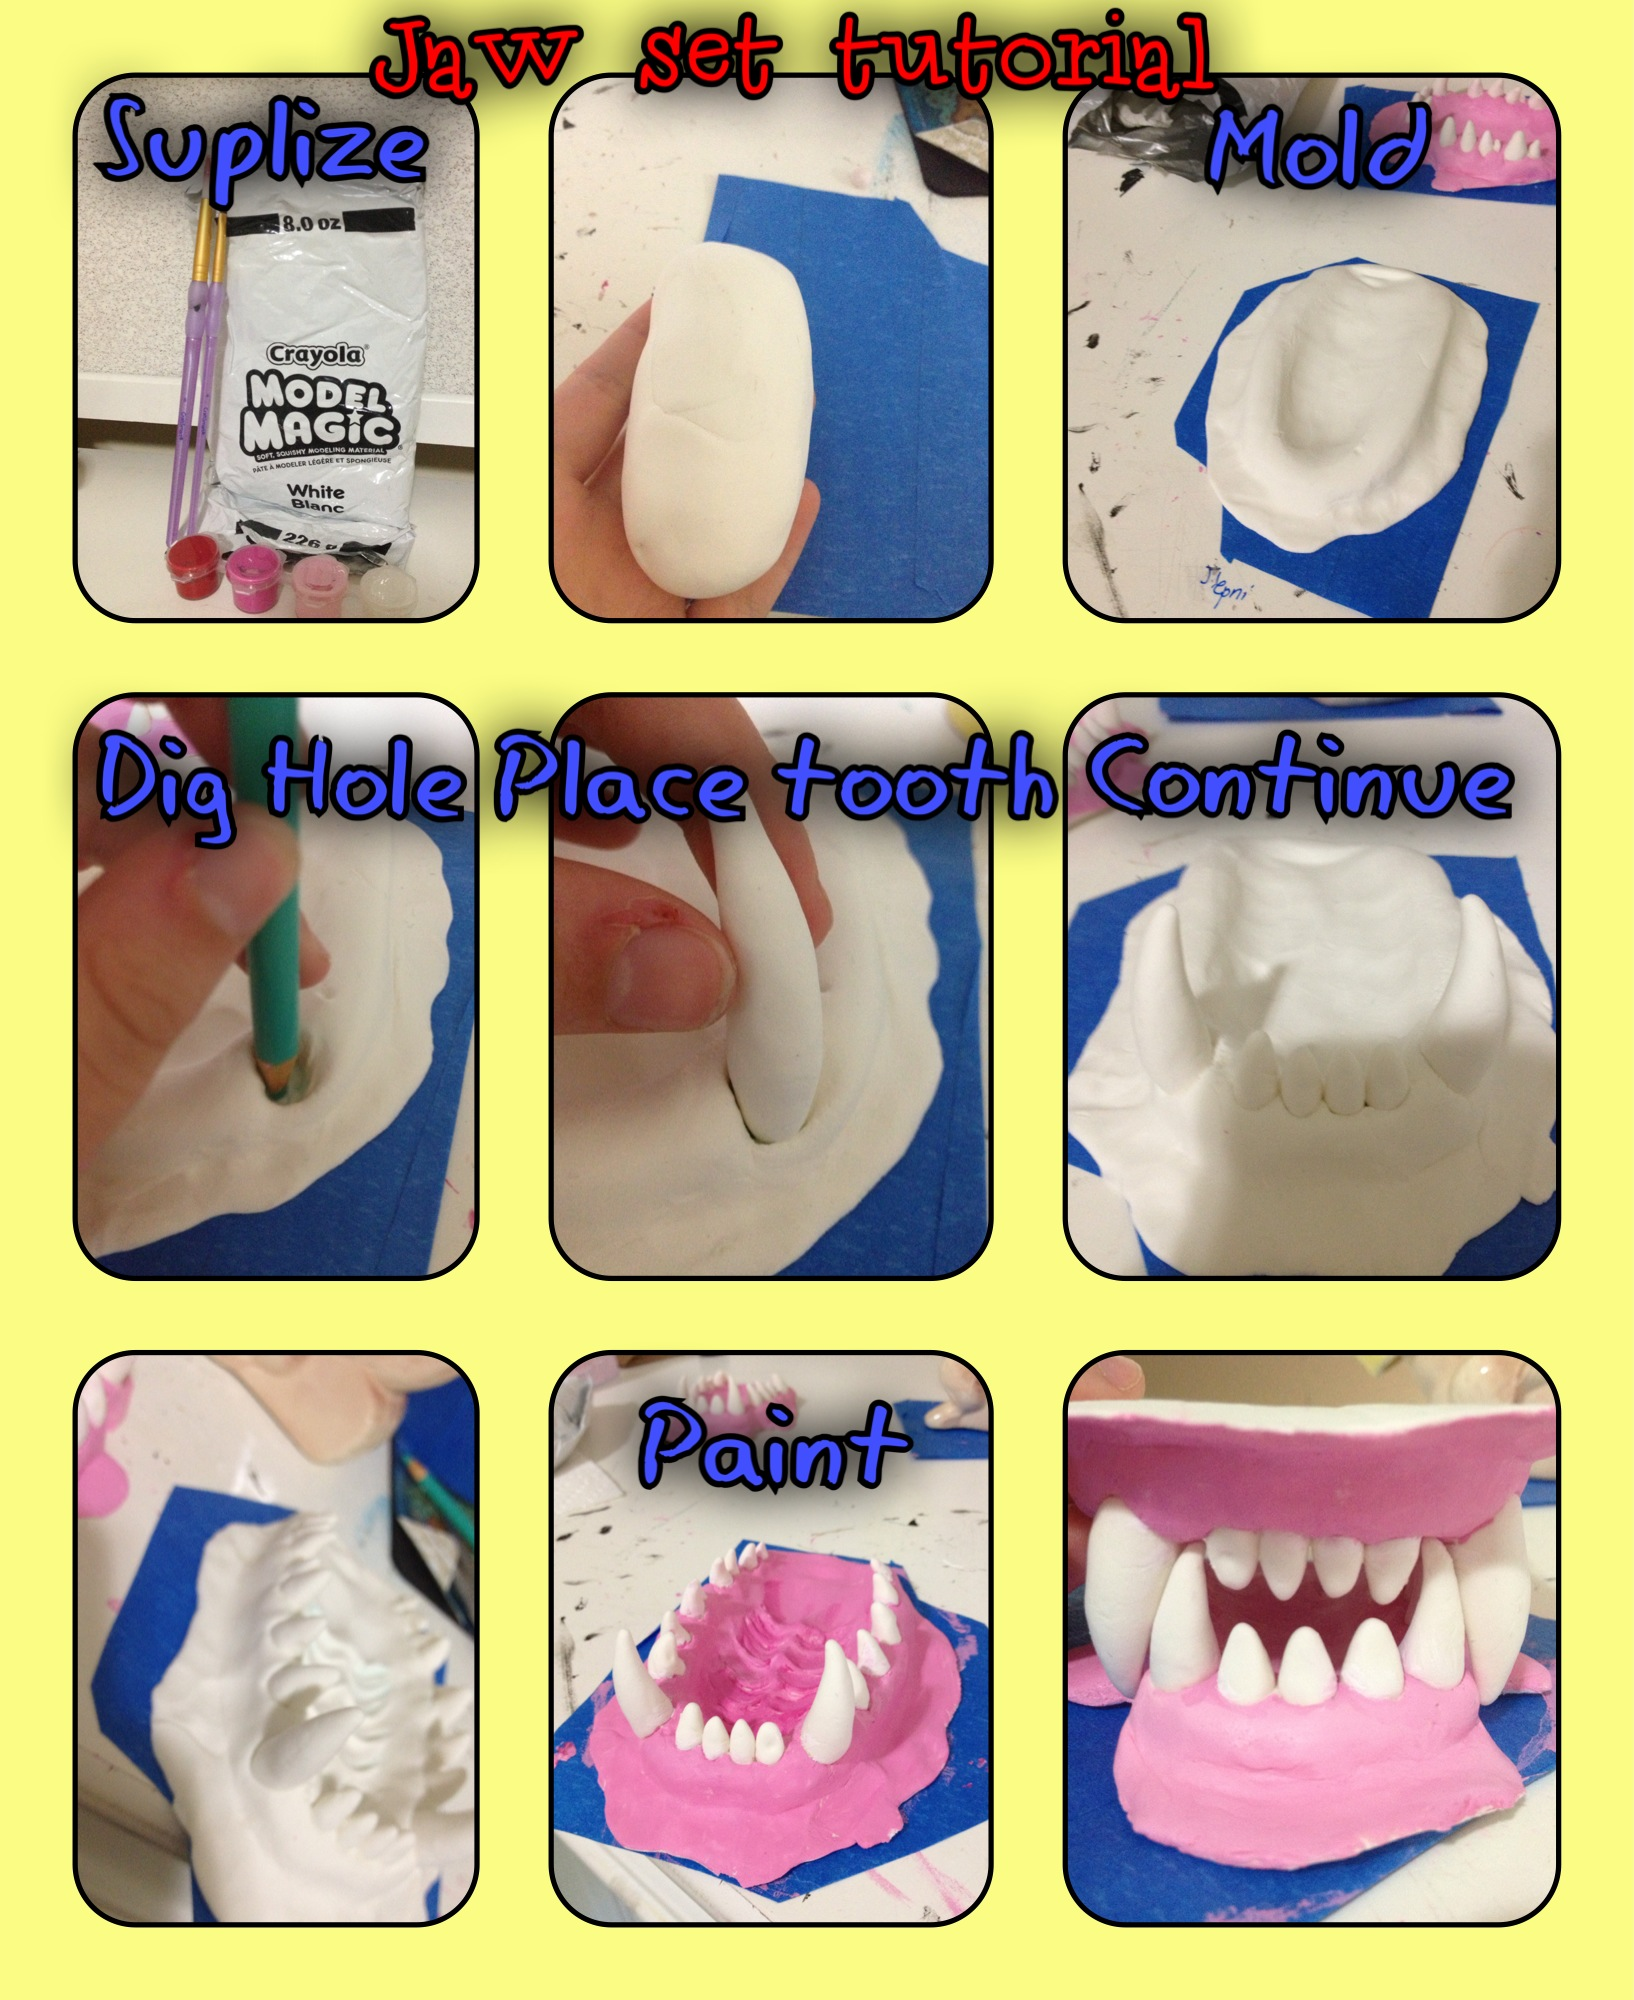 Tsebresos 462 43 Jaw Set Tutorial By Huntressnoko Toothless By Refira Dragon  Quadsuit Wwwgalleryhipcom Quadsuit Stilts By Adamonexmortis